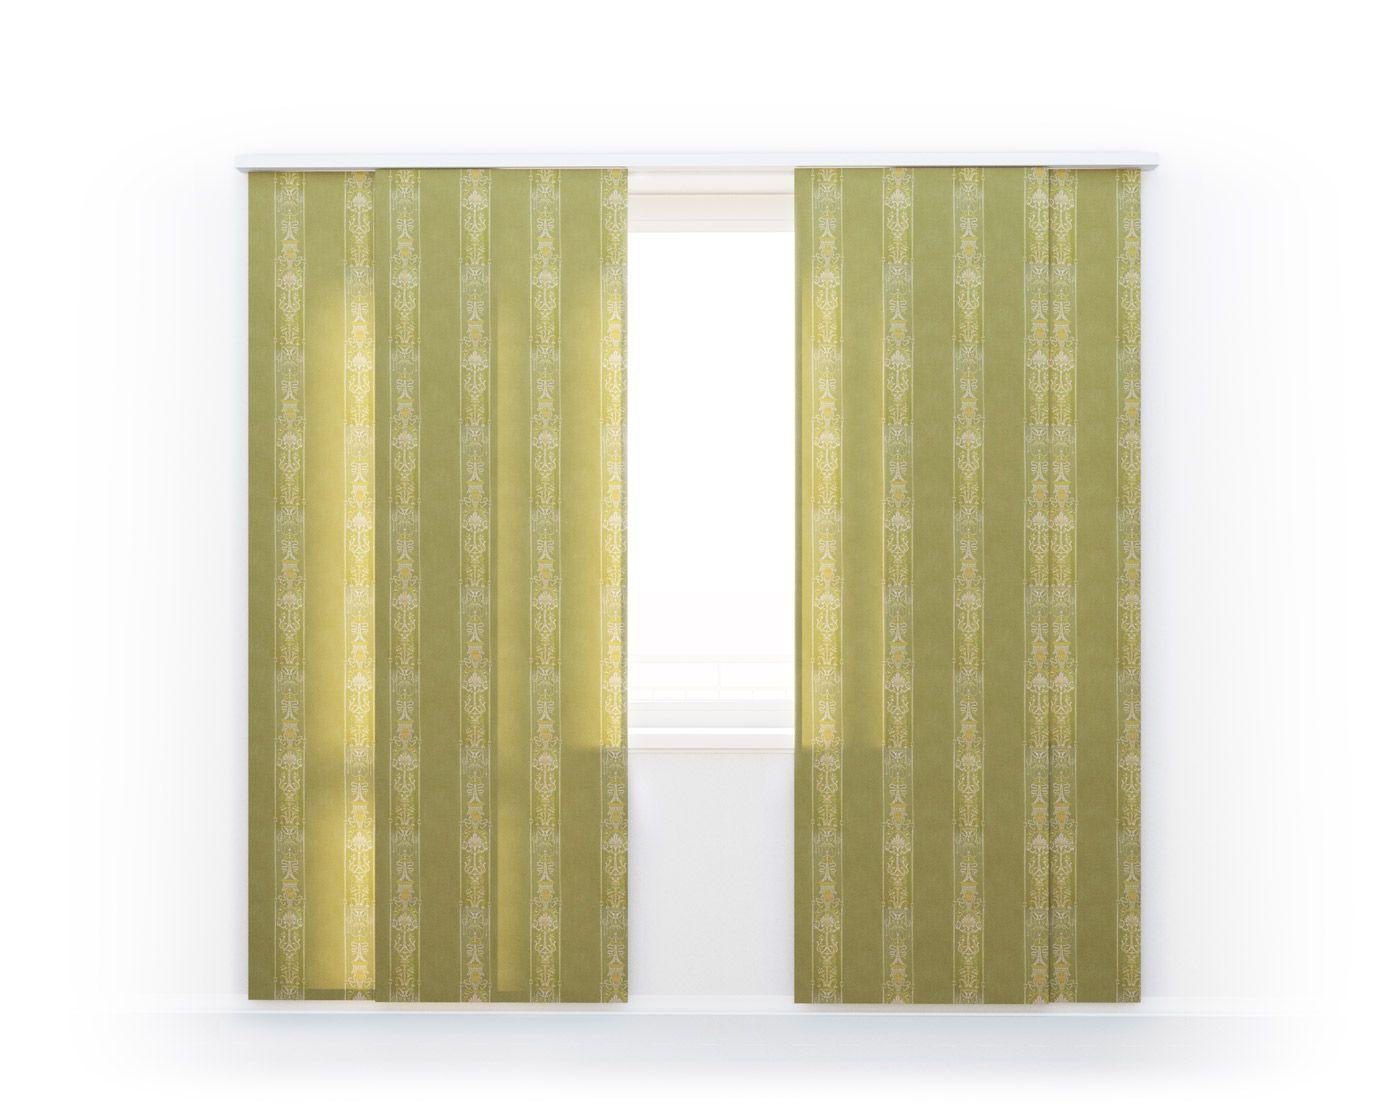 Японские шторы Louis D'or, 2380/51